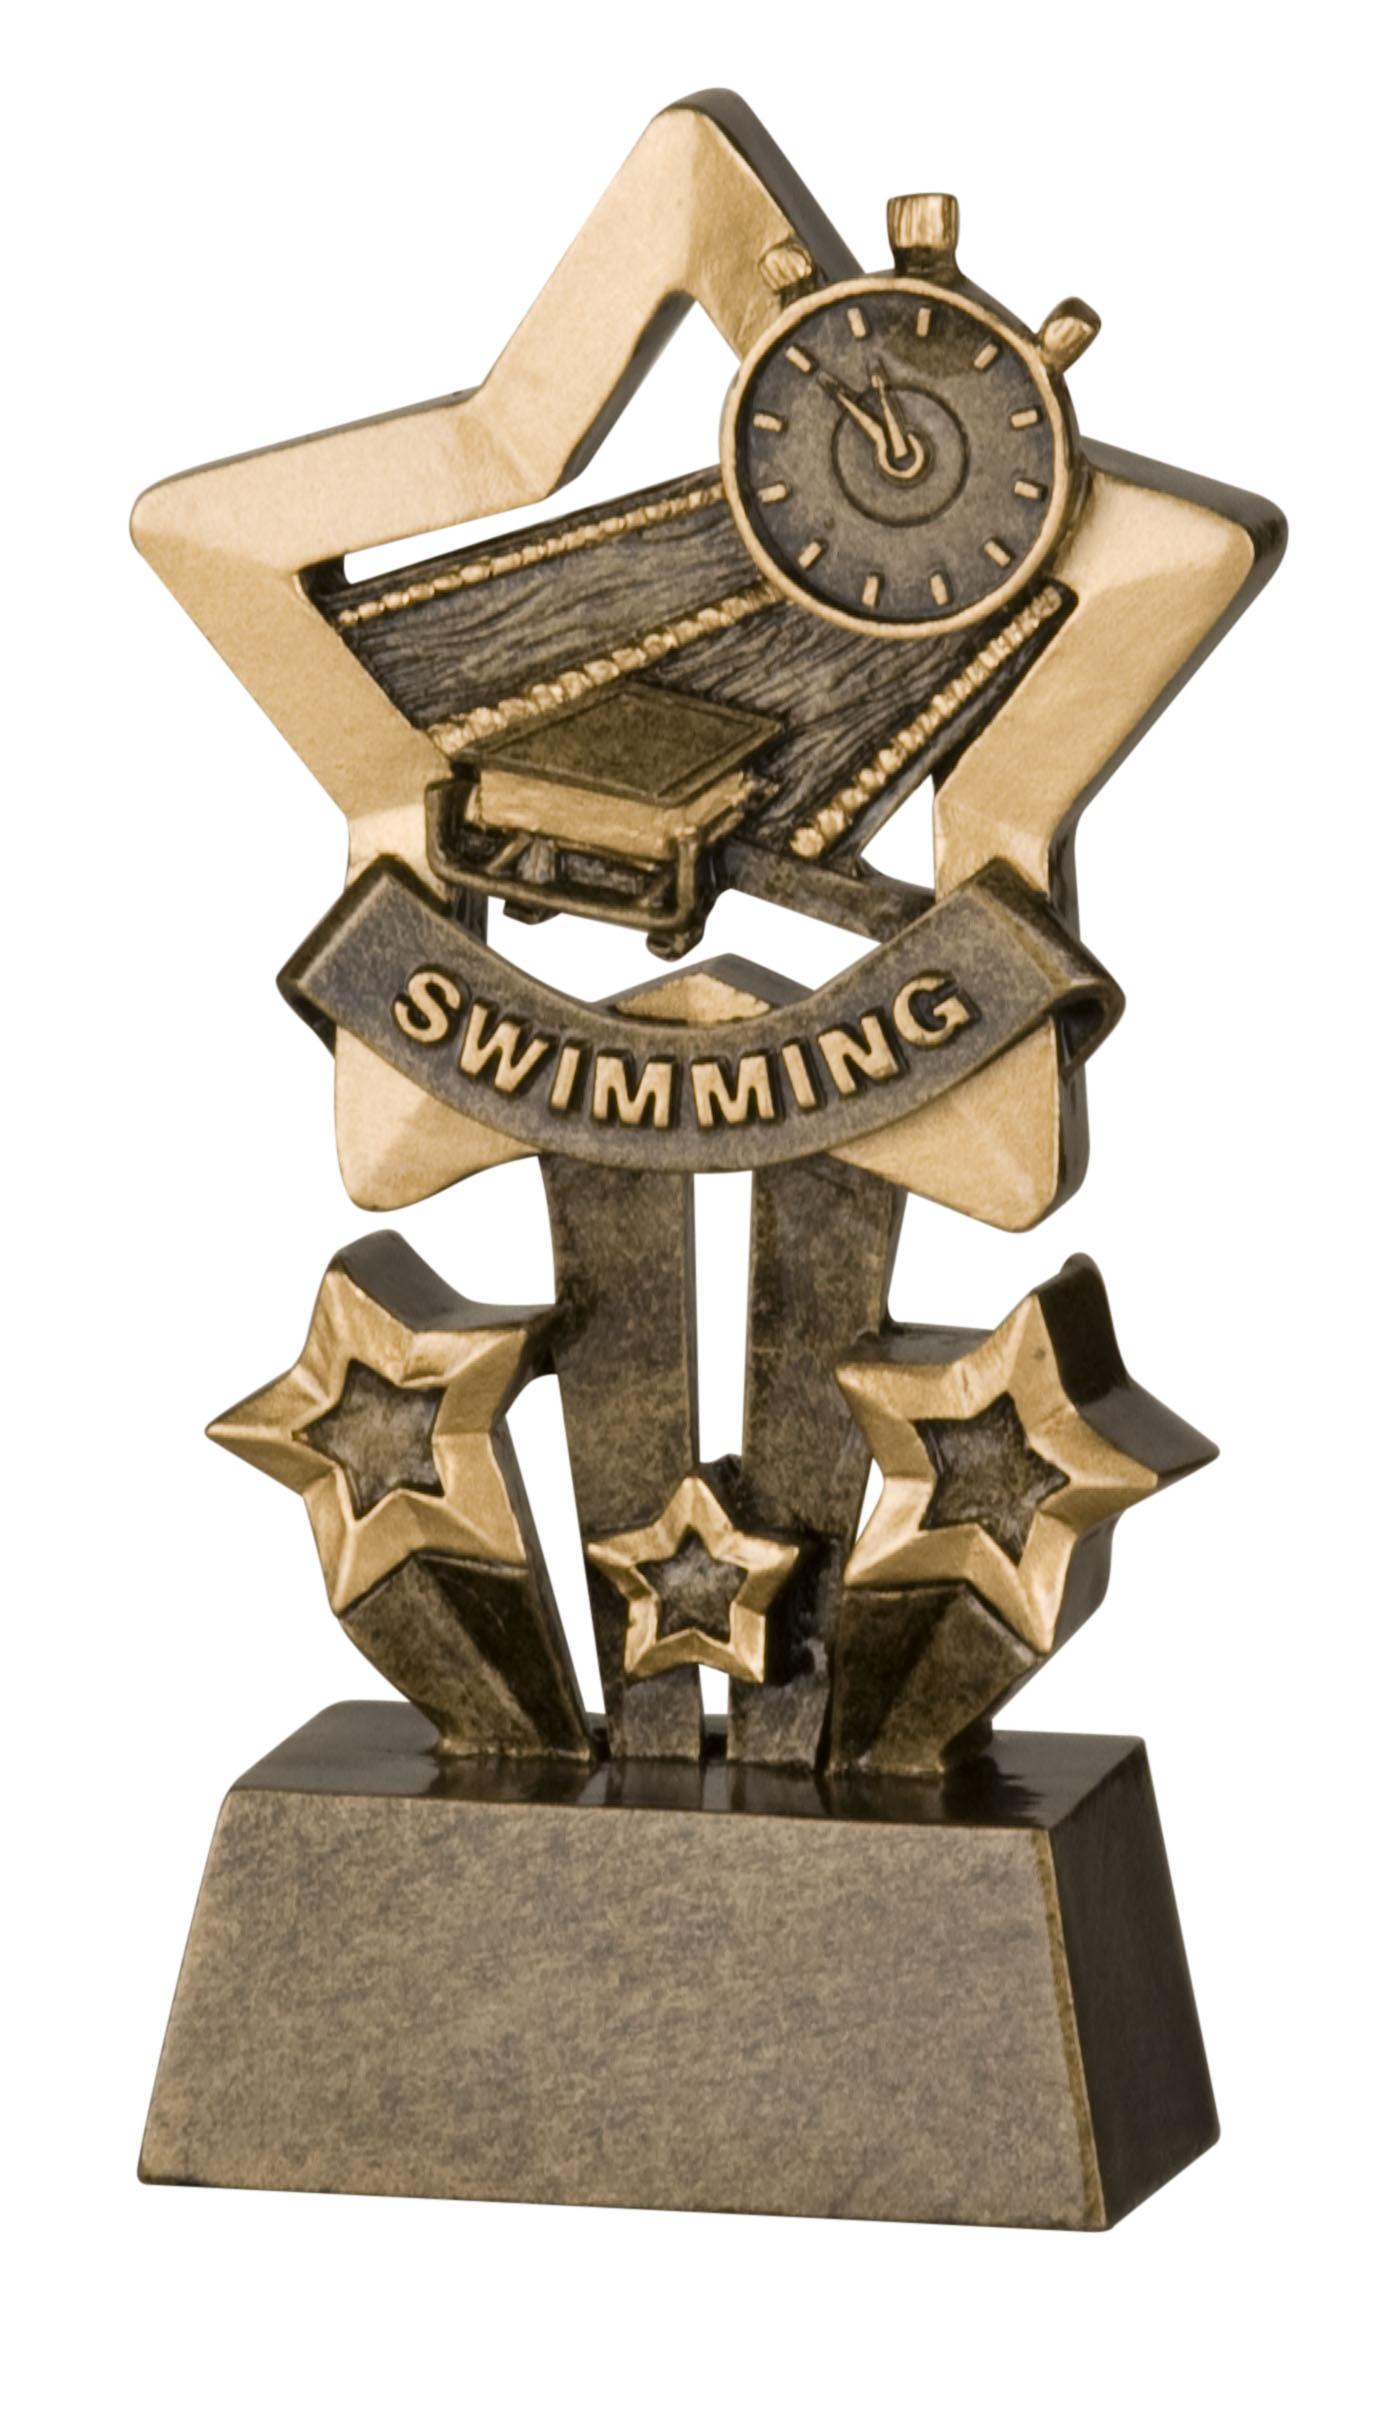 Swimming - STR-13